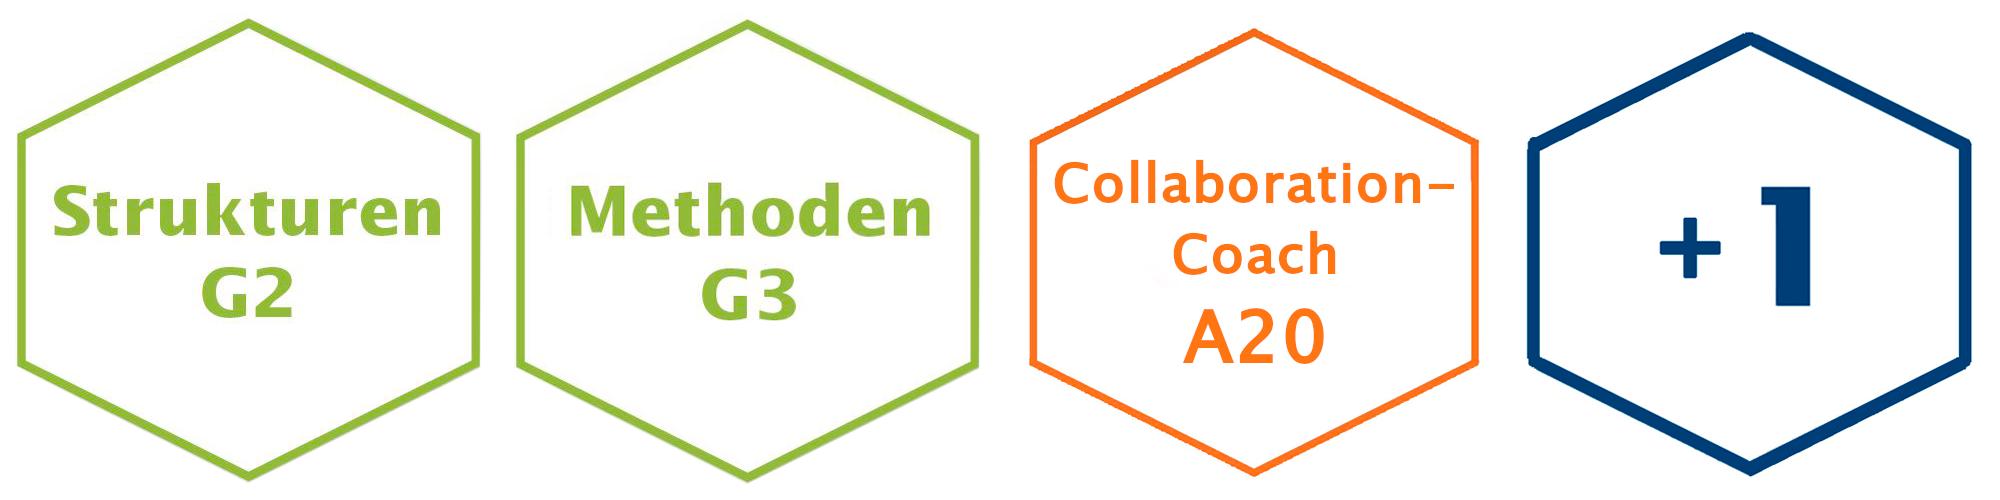 Collaboration-Coach Ausbildung Module